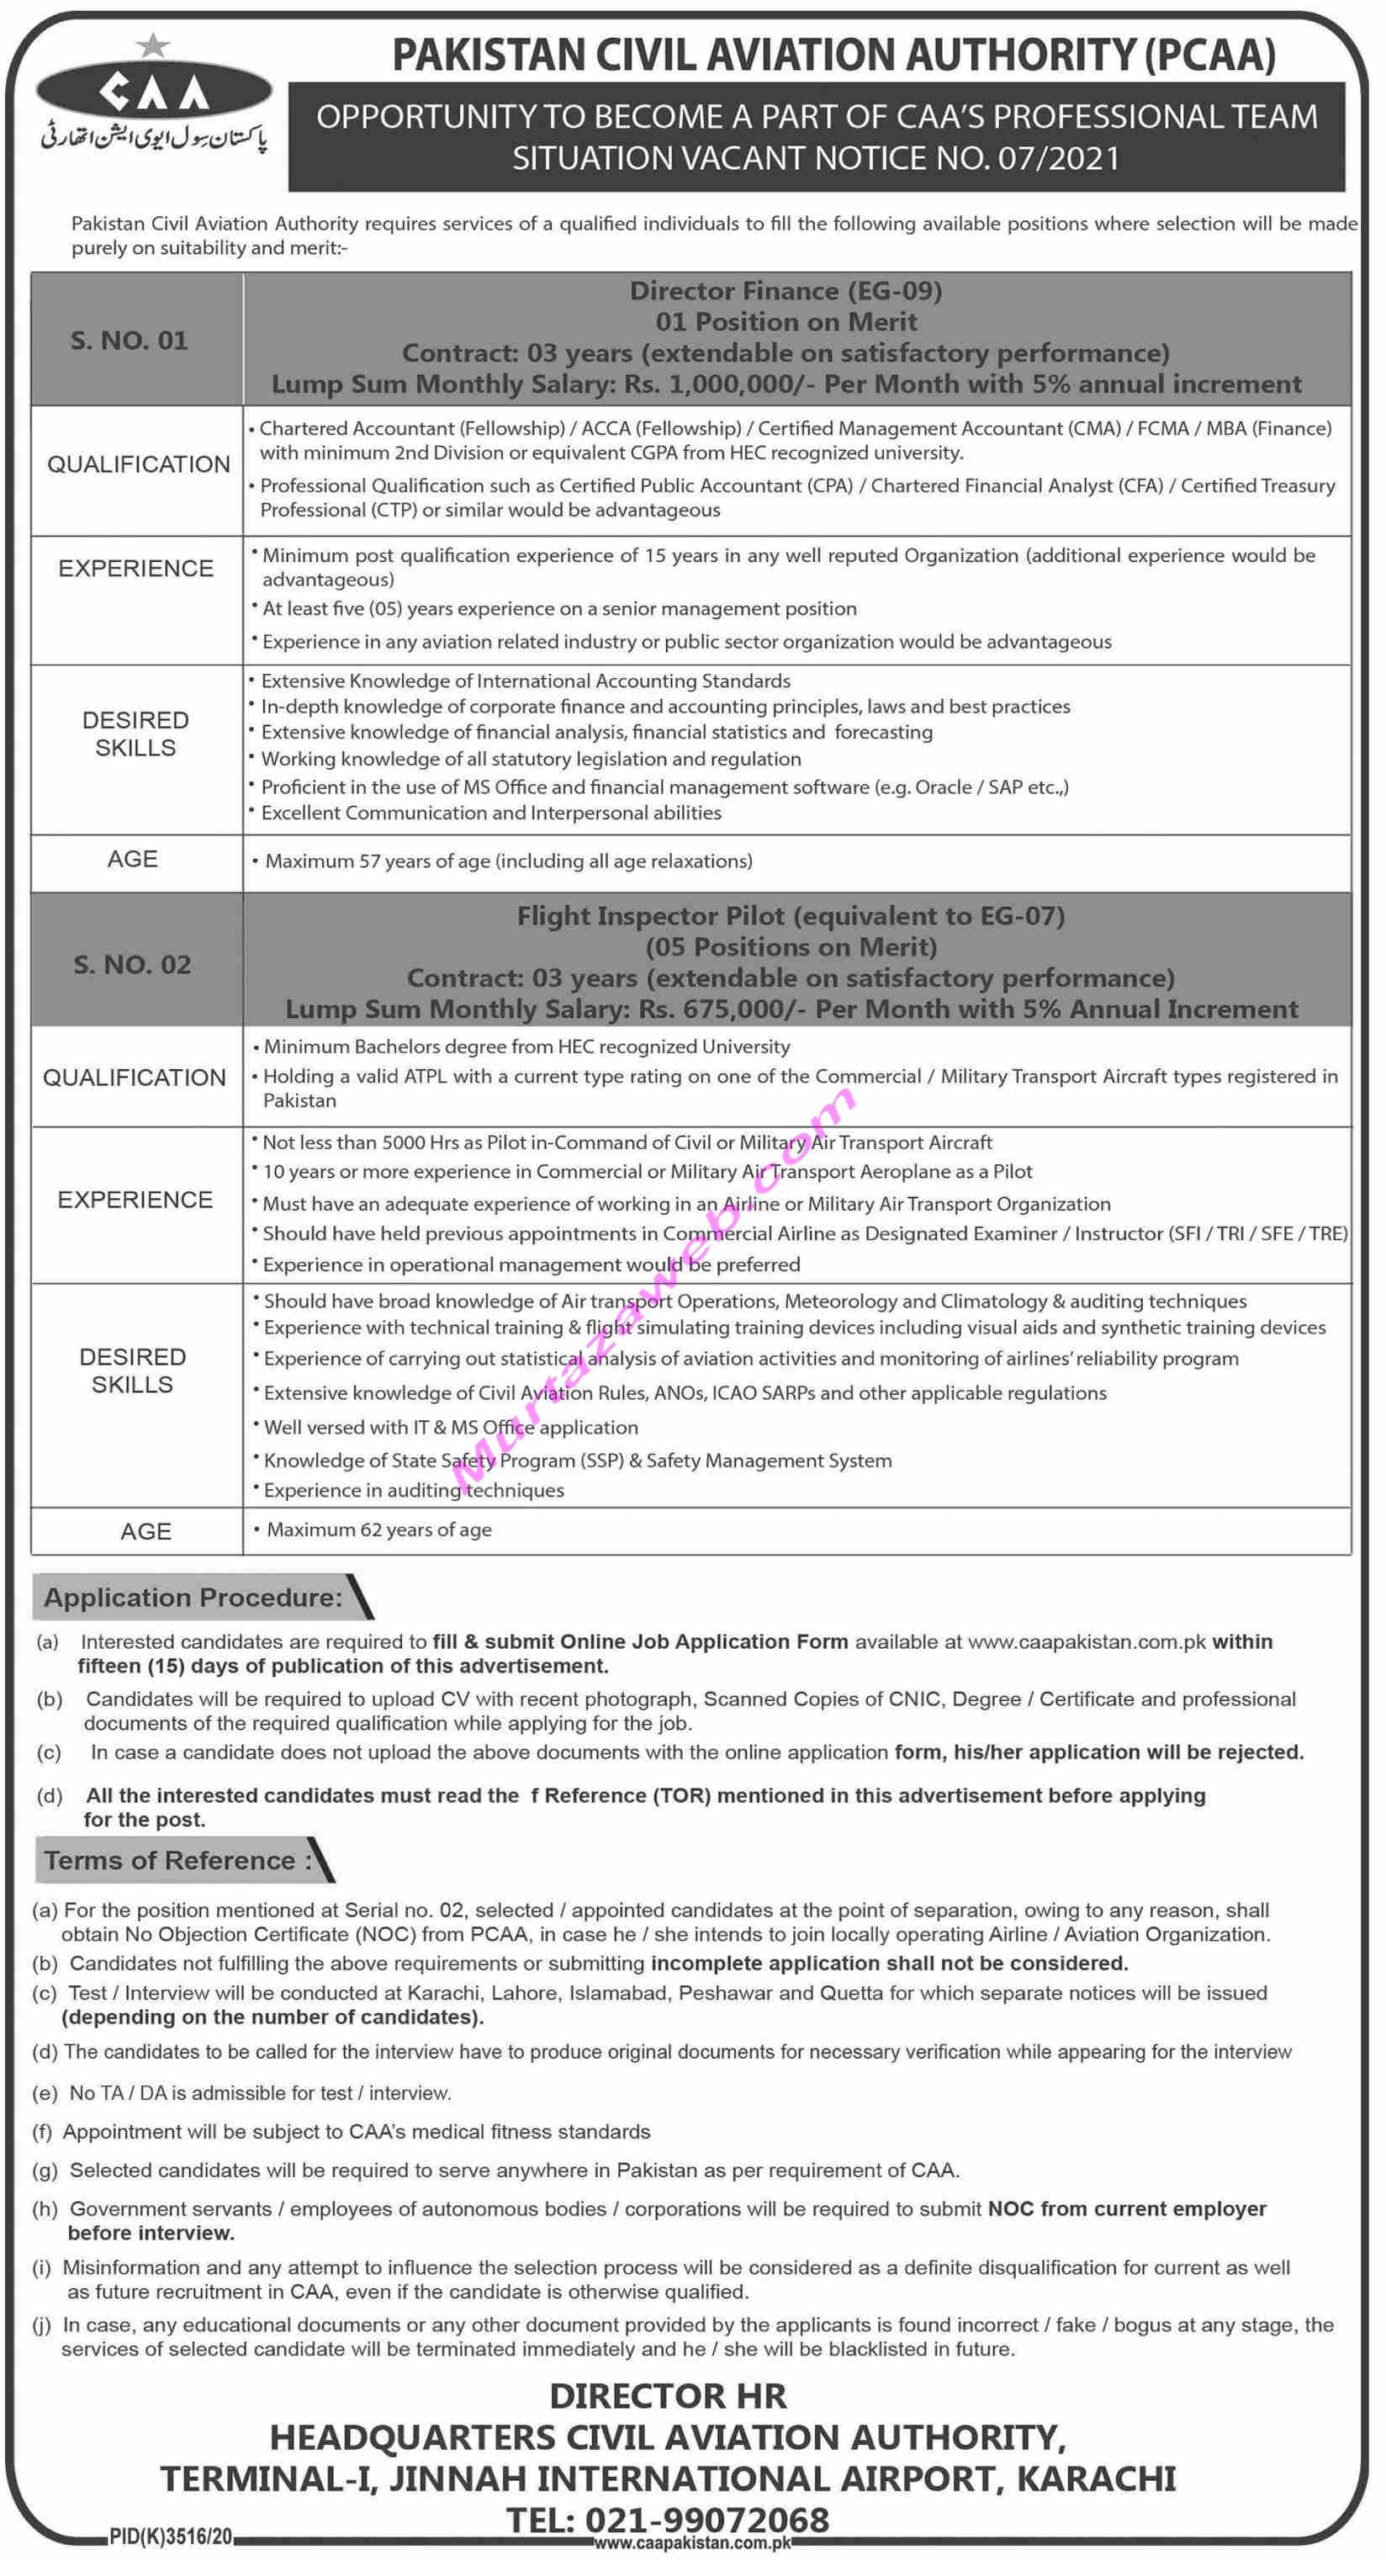 Pakistan Civil Aviation Authority PCAA Jobs 2021 for Director Finance